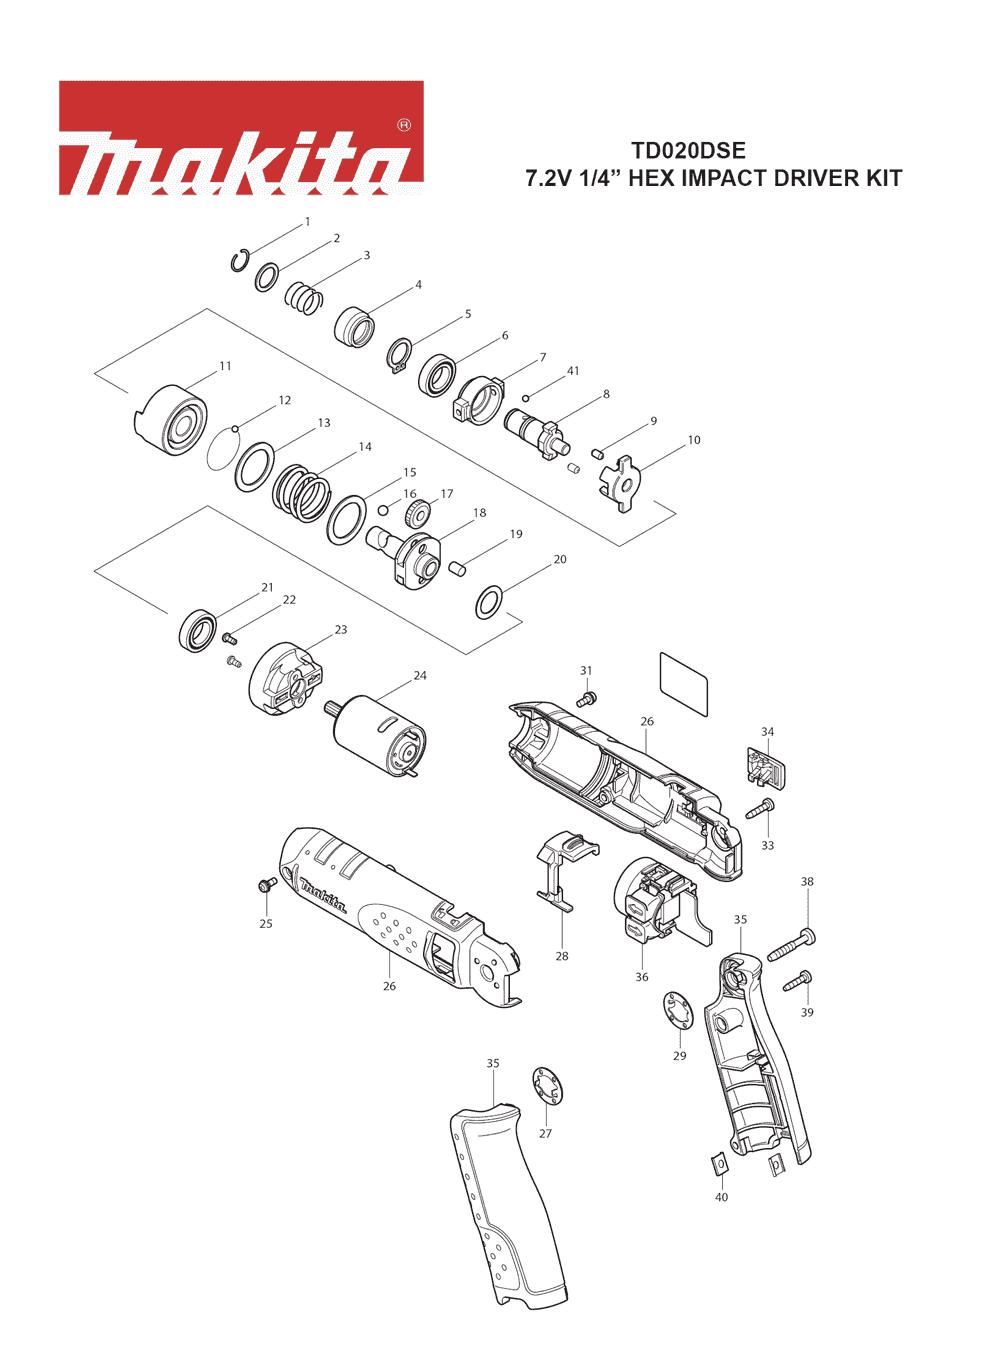 Abb Drives Wiring Diagram also Multi Sd Motor Wiring Diagram additionally 2 Sd Maytag Washer Wiring Diagram further Variable Sd Motor Wiring in addition Lodestar Wiring Diagram. on single phase 2 sd motor wiring diagram